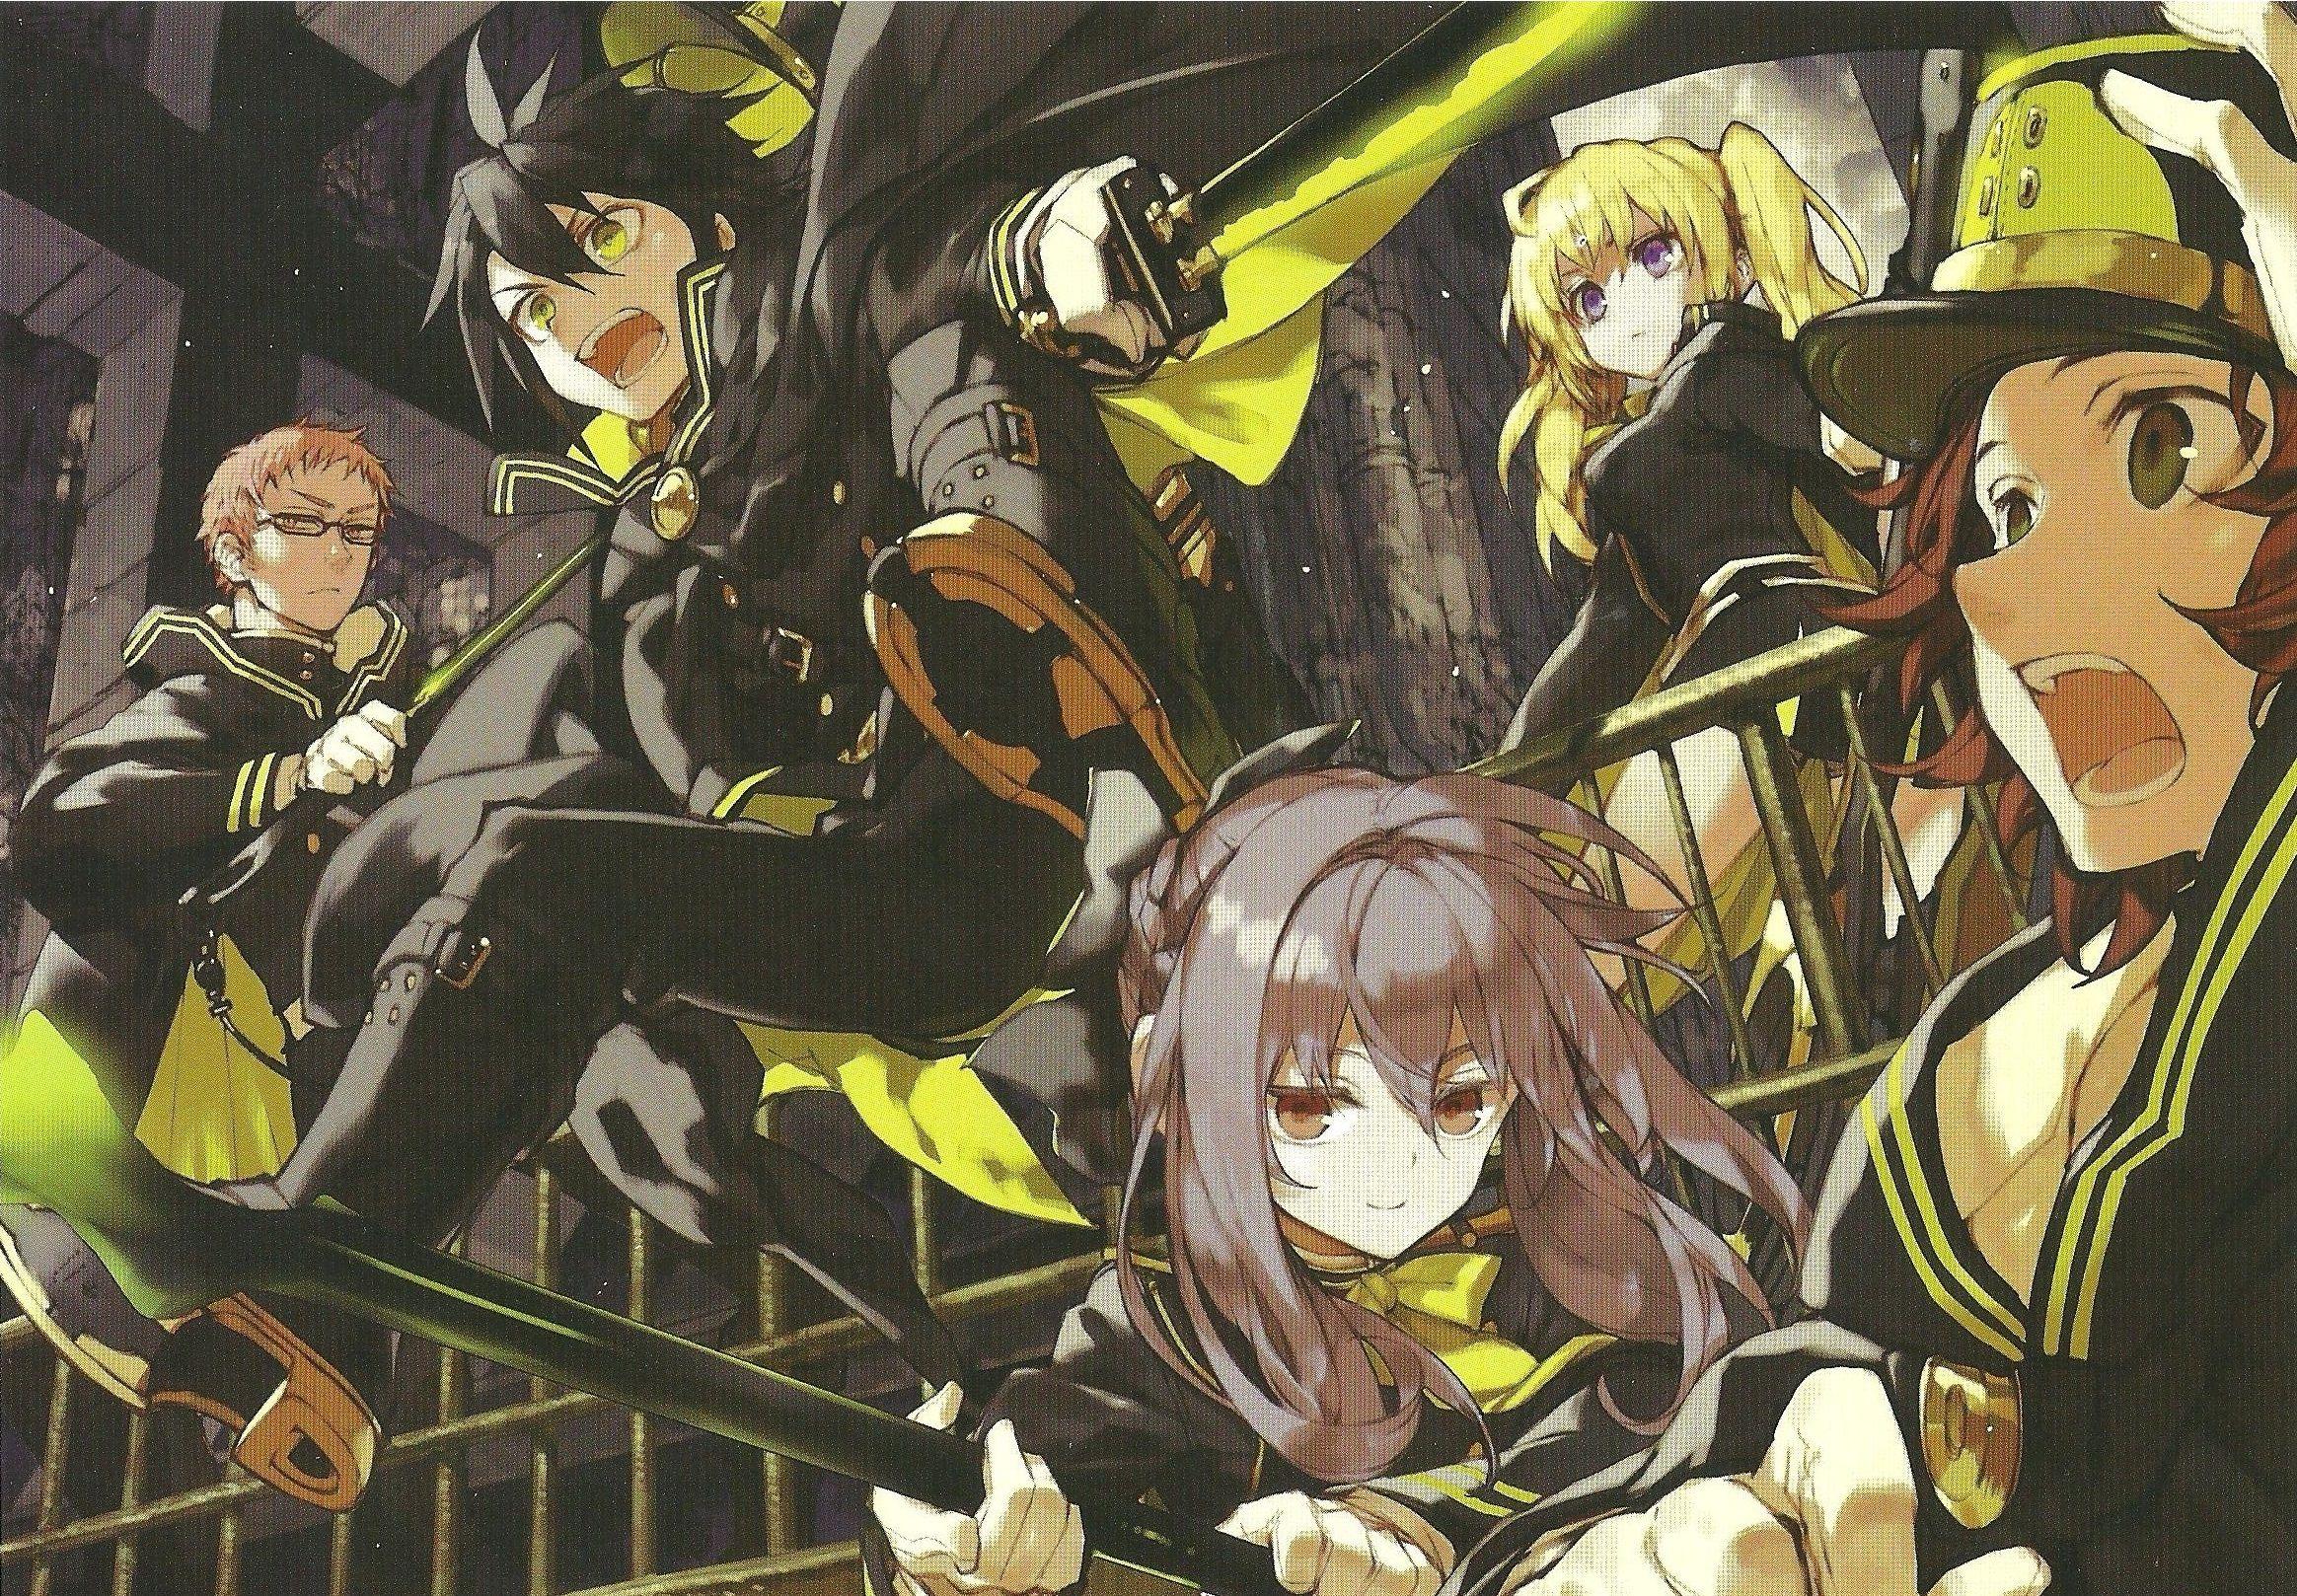 Owari no Seraph Wallpaper anime HD by corphish2.deviantart